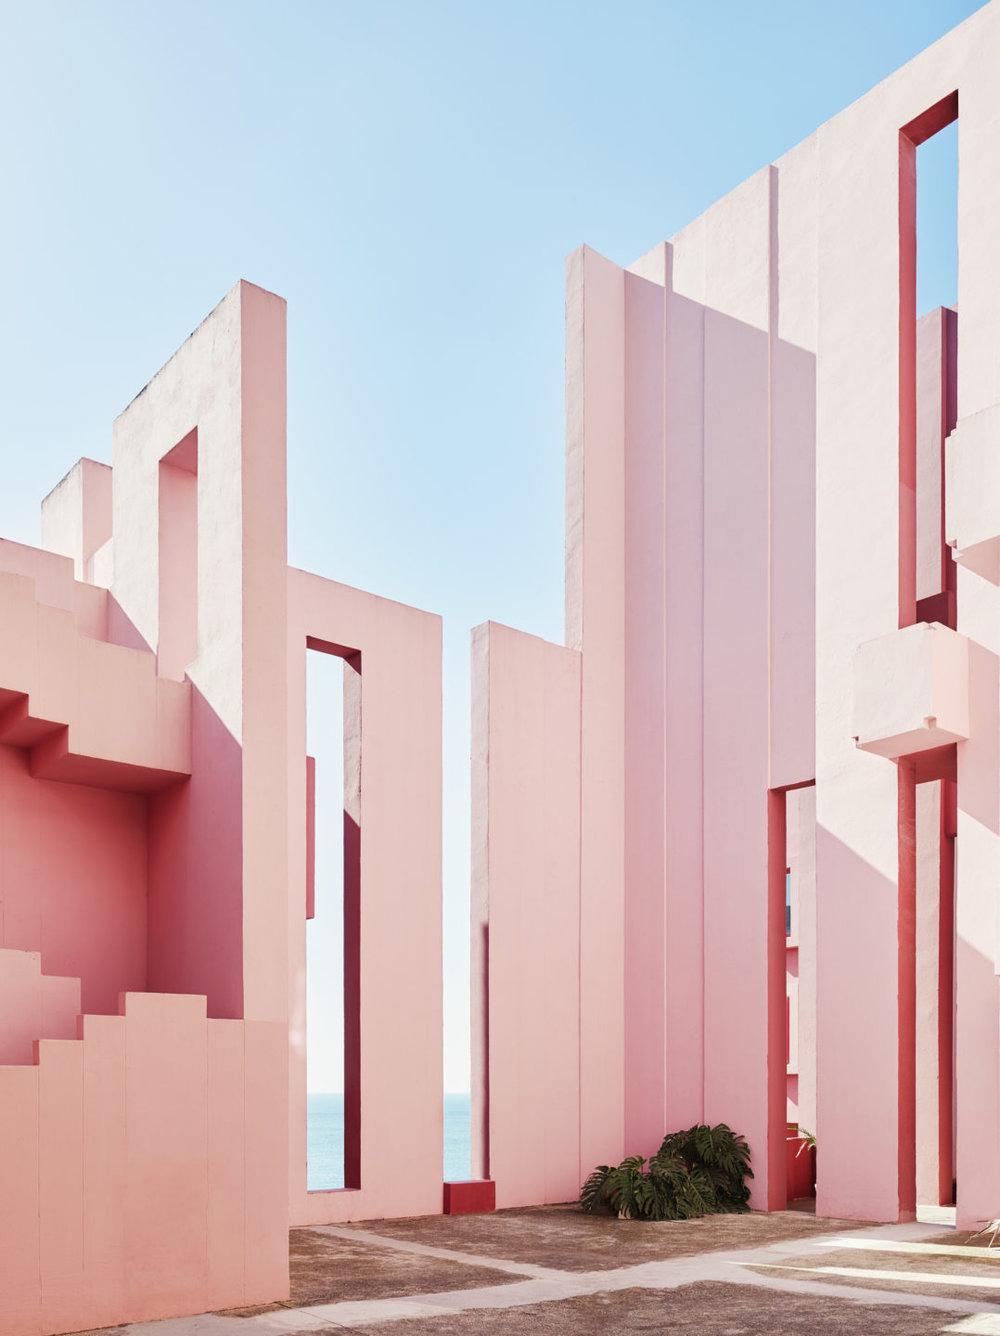 Muralla_Roja_Calpe_Spain_Ricardo_Bofill_Taller_Arquitectura_011b-1078x1440.jpg